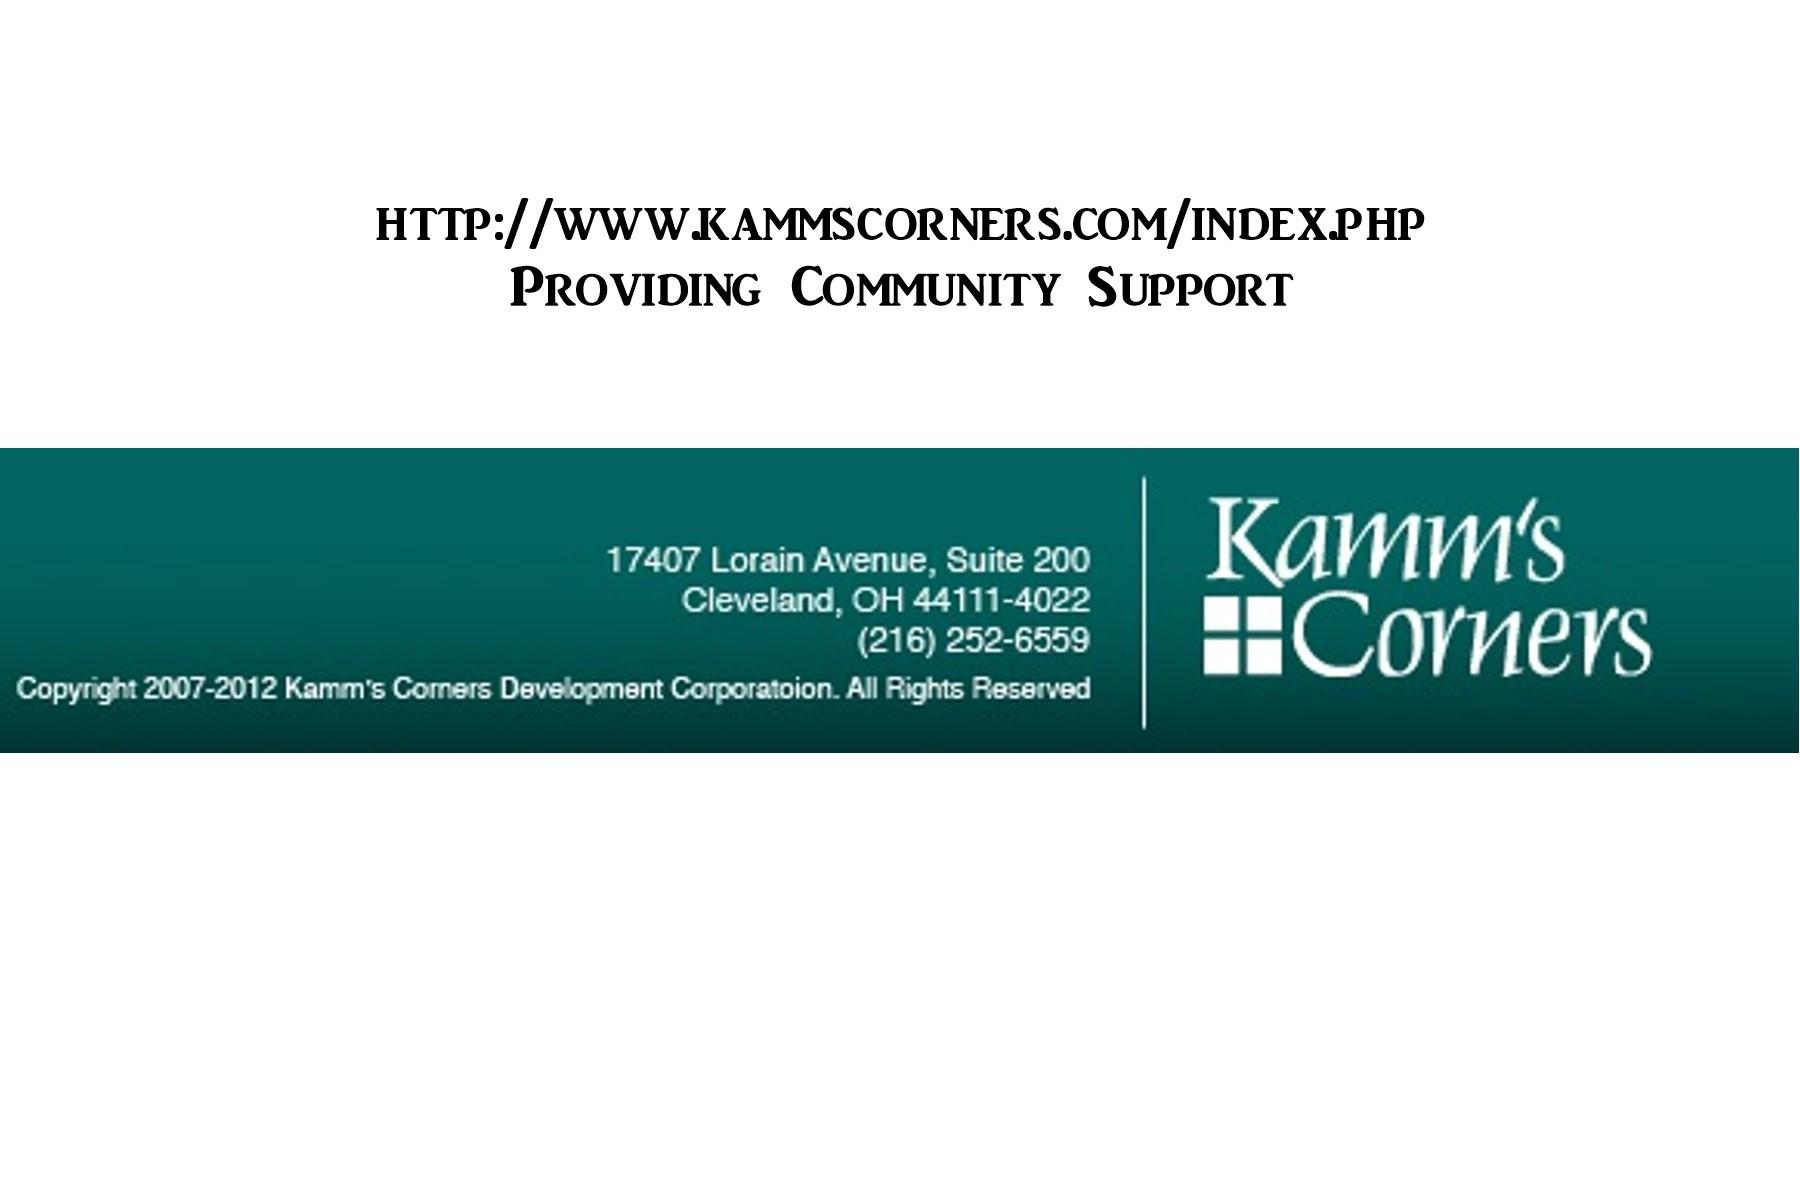 Kamms Corner Dev Corporation